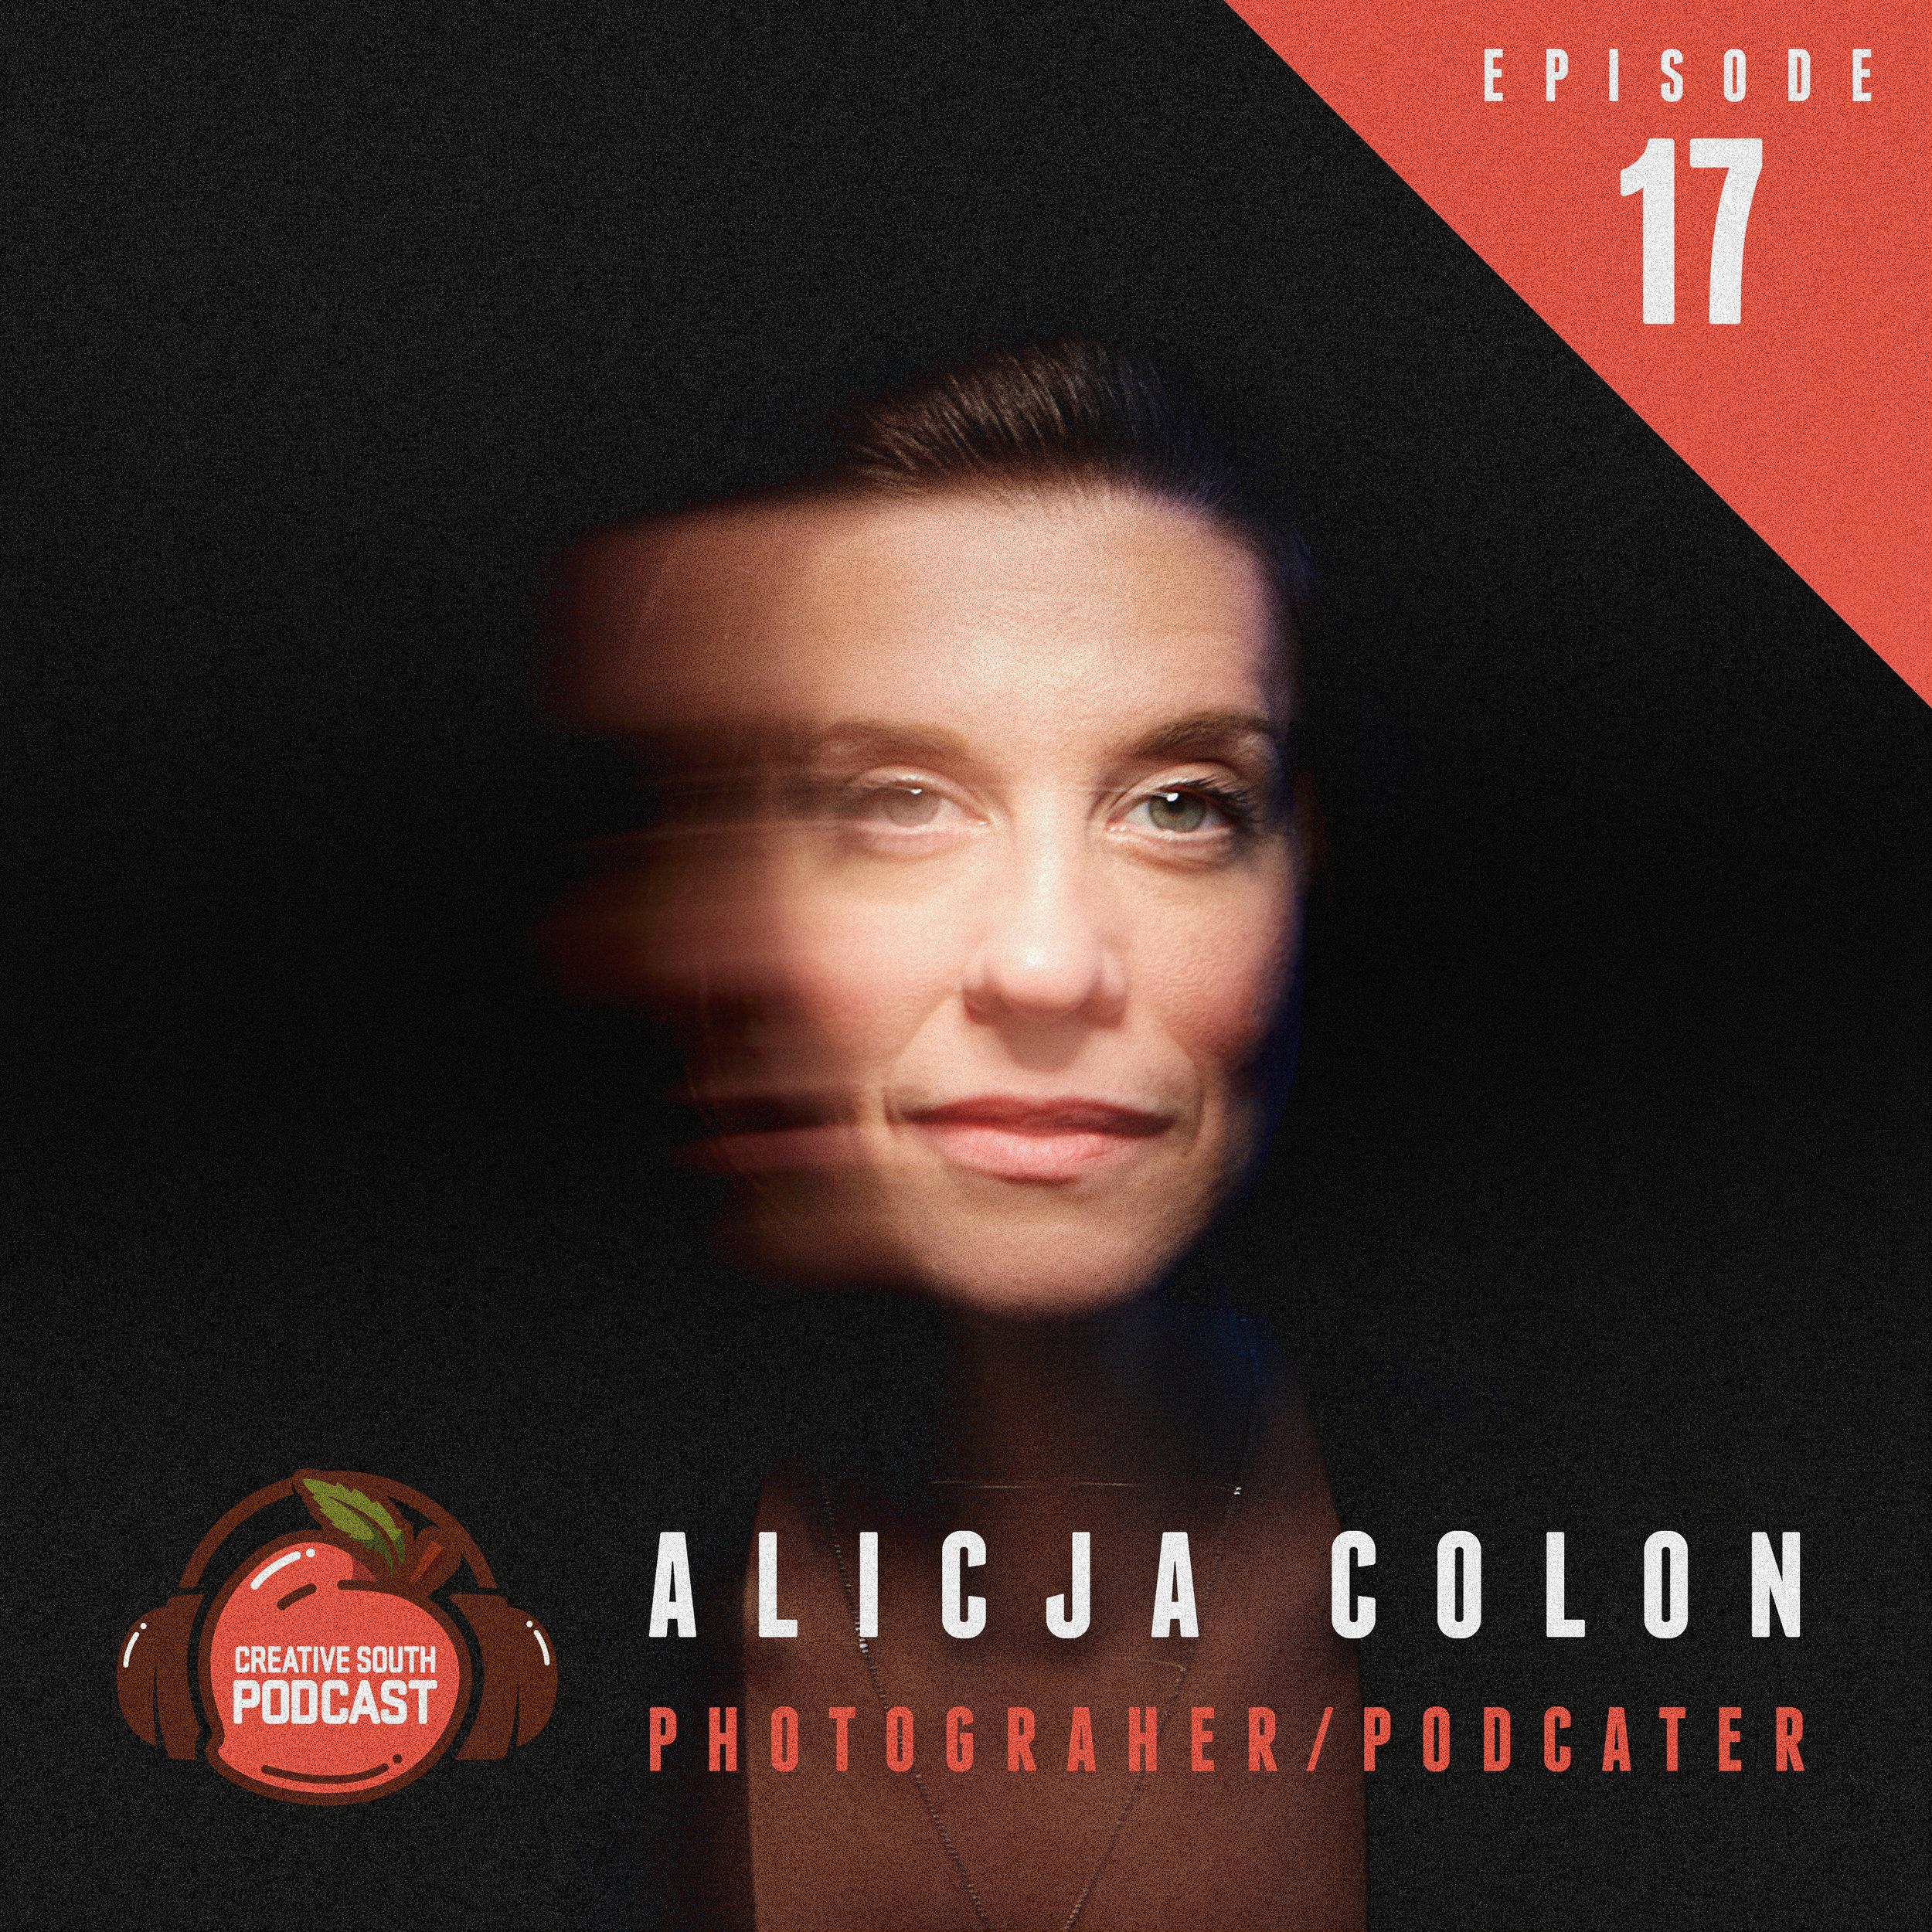 Alicja-Colon-Cover.jpg